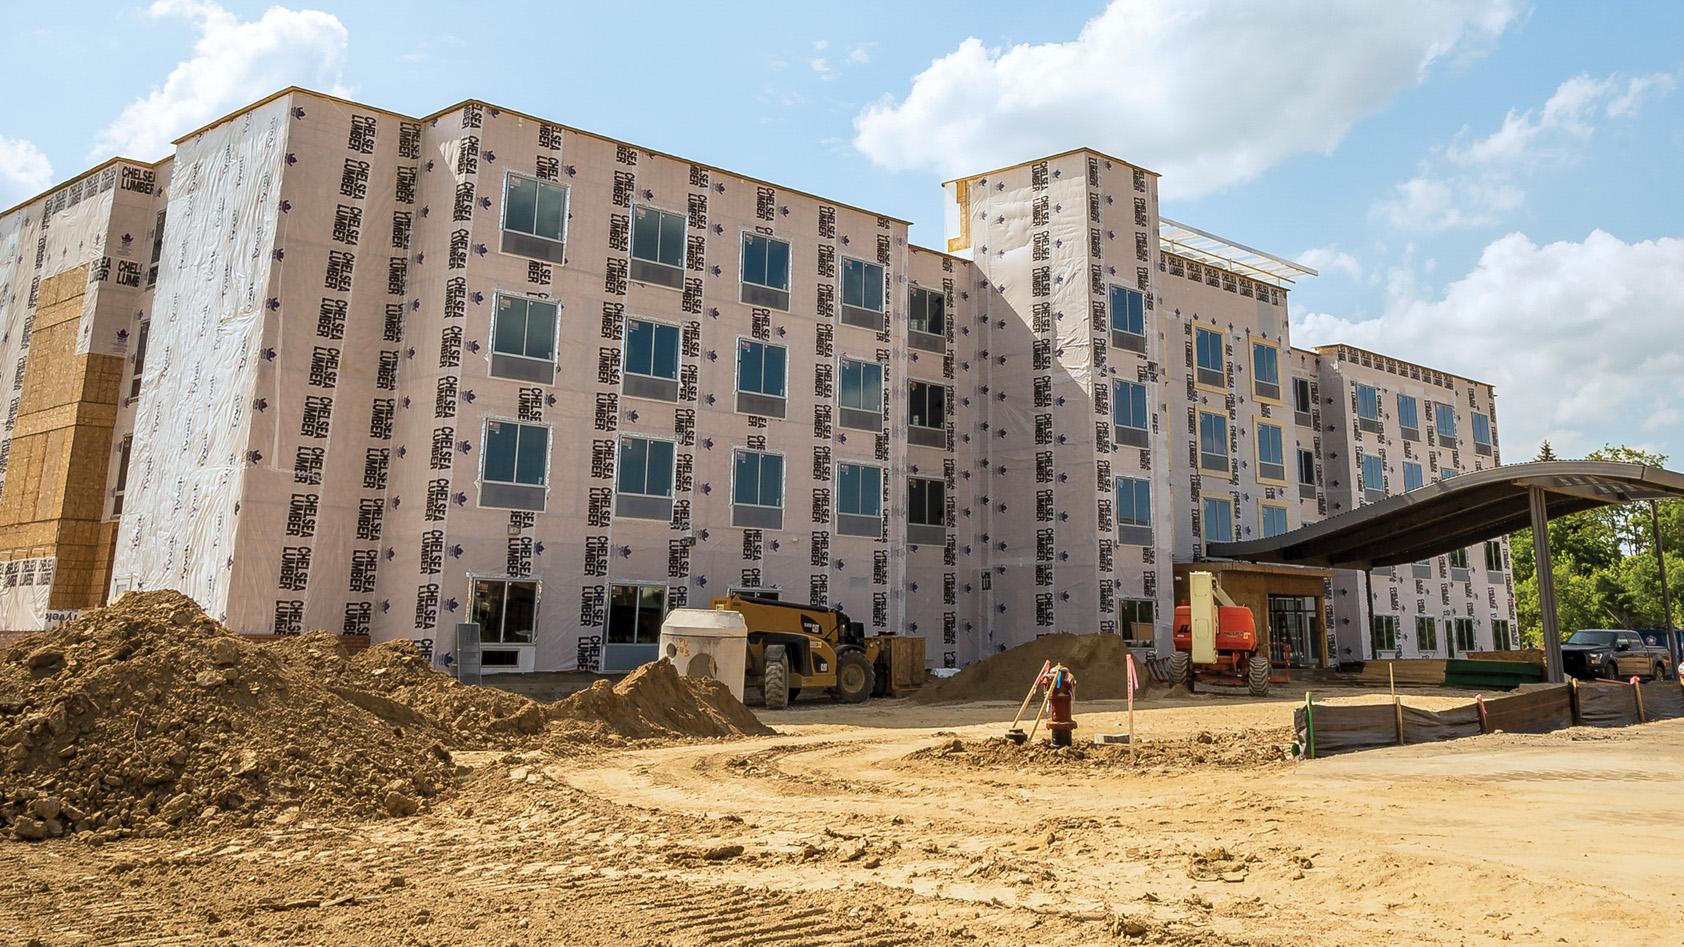 Construction of Fairfield Inn & Suites, Grand Blanc Twp, MI